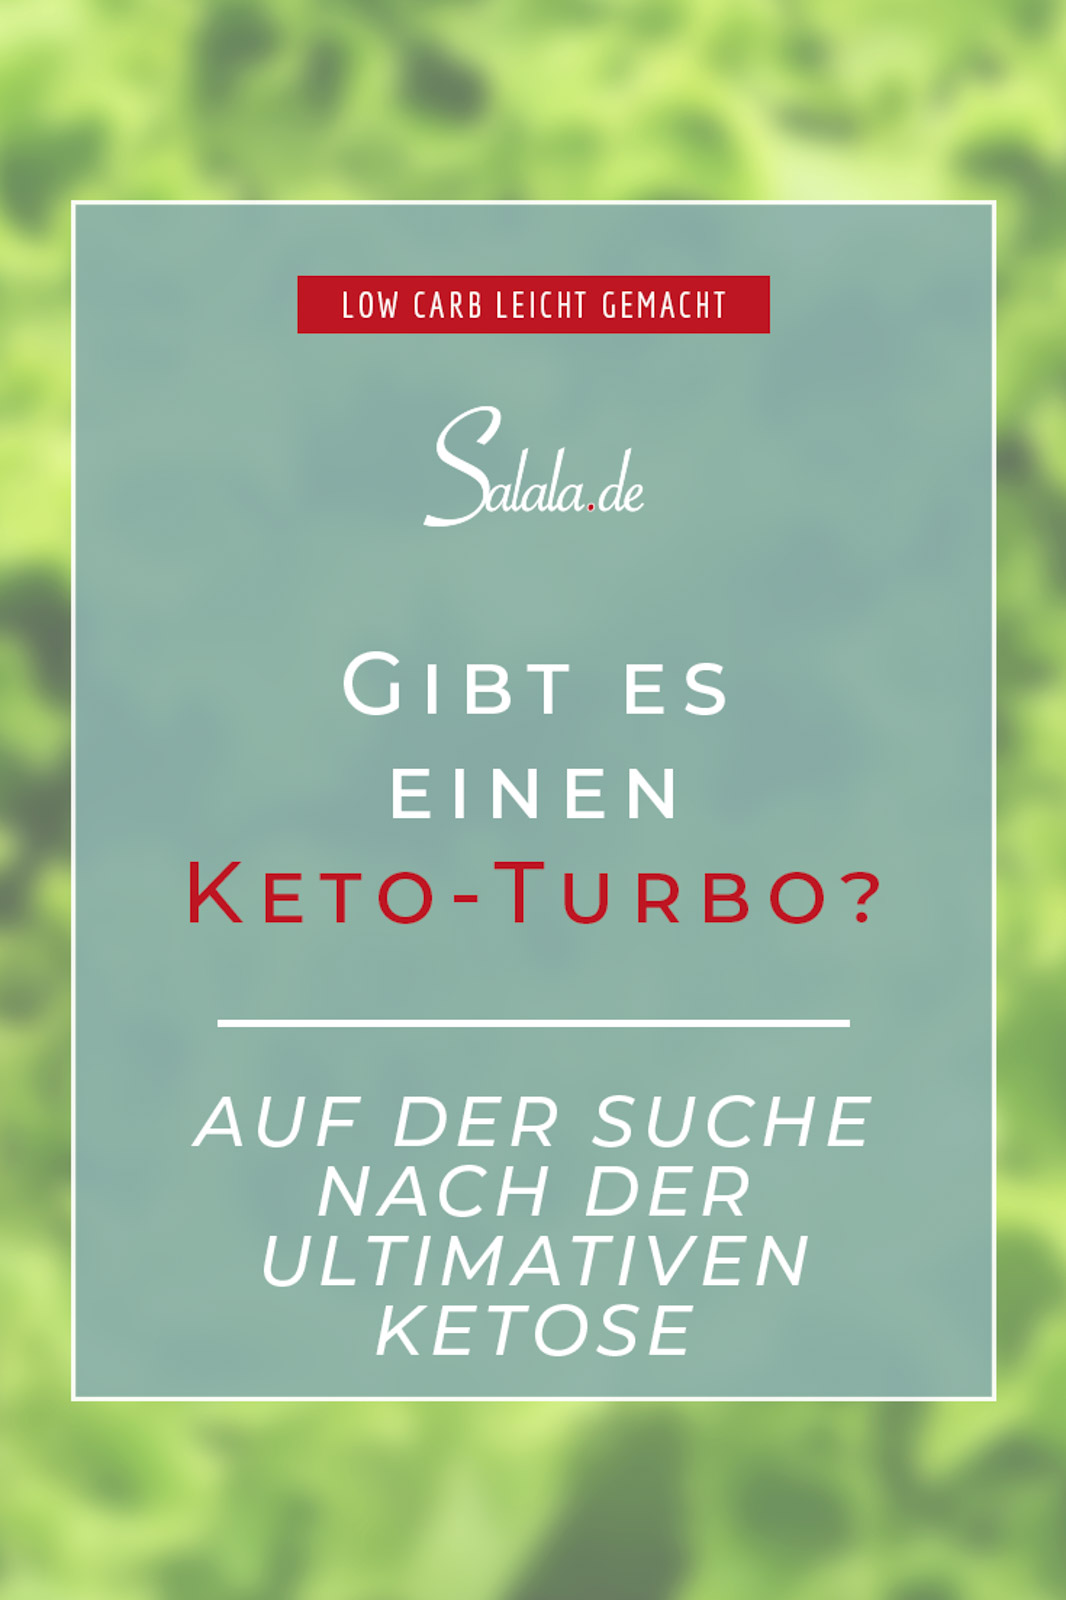 #keto #ketoonsteroids #abnehmen #ketose #turboketo